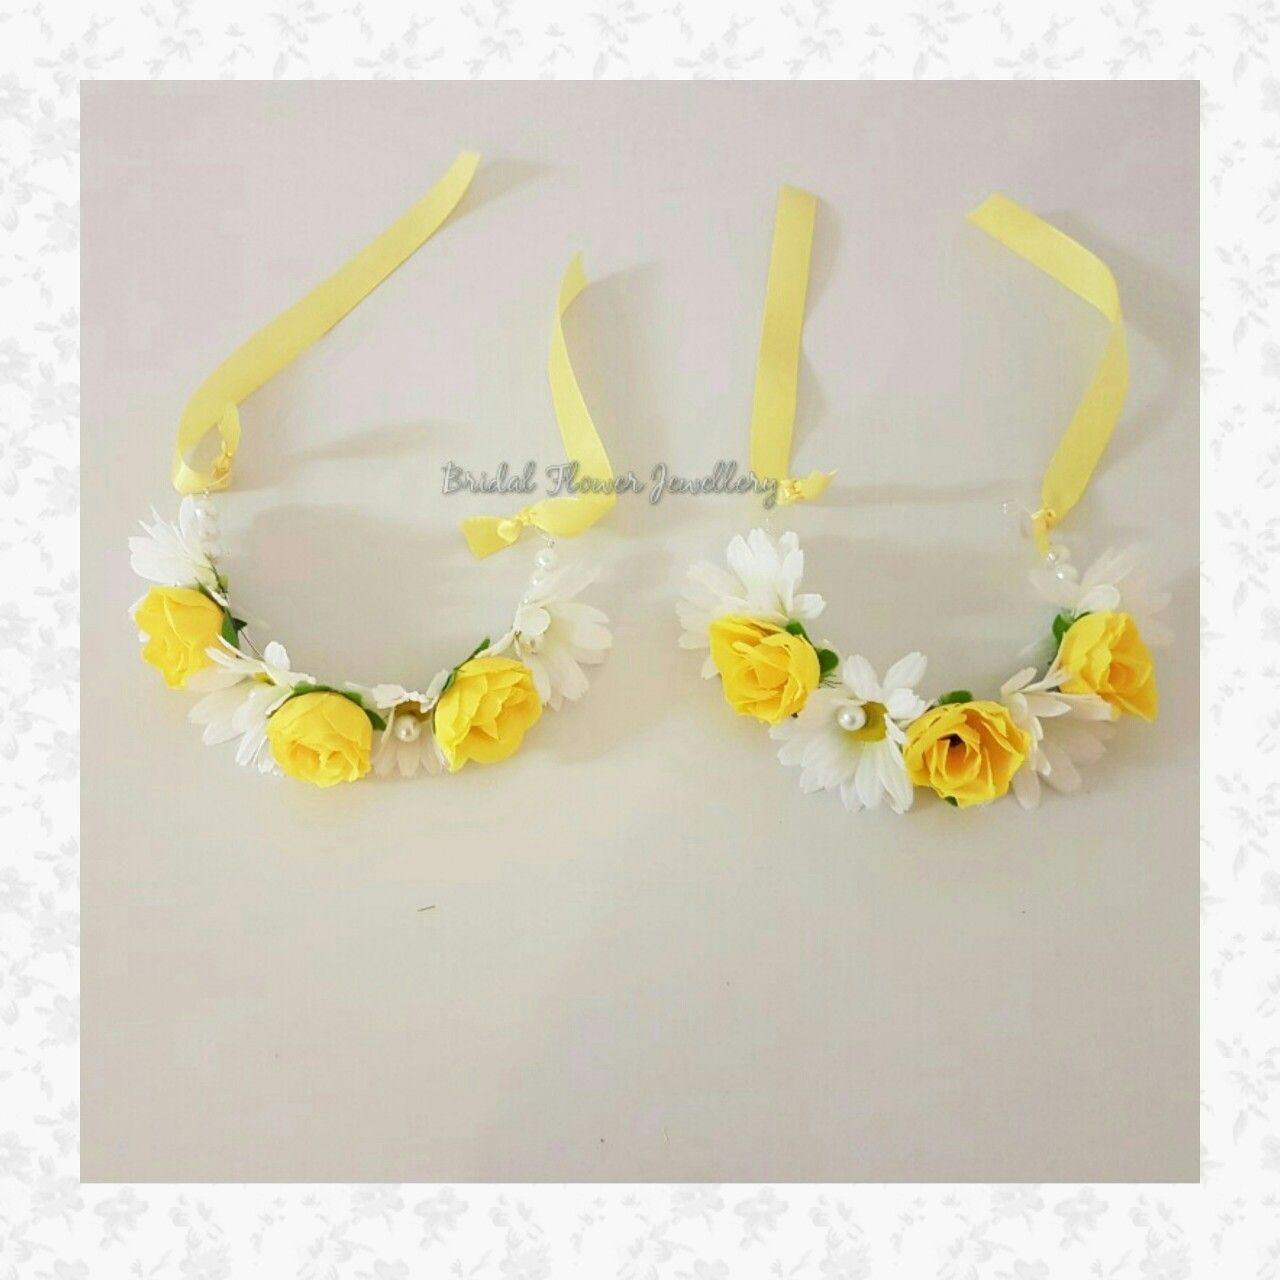 Artificial flower bangles by Bridal Flower Jewellery www ...